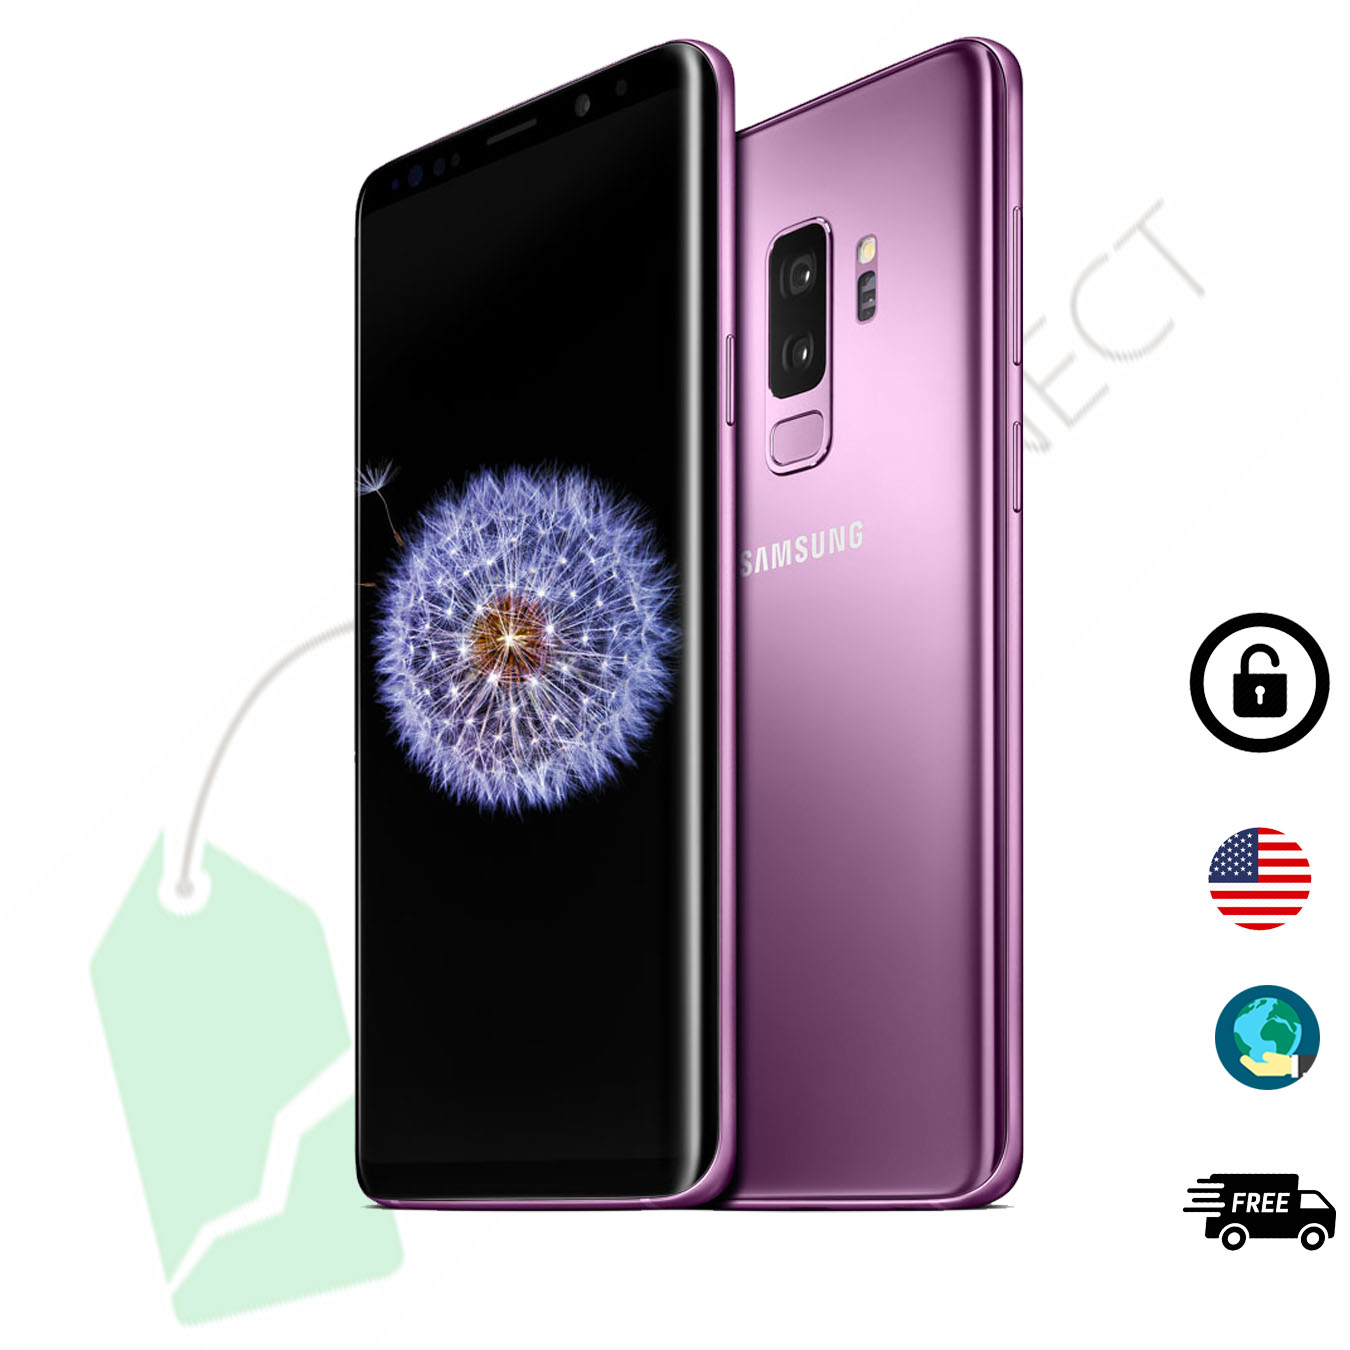 Samsung Galaxy S9+ GSM Unlocked